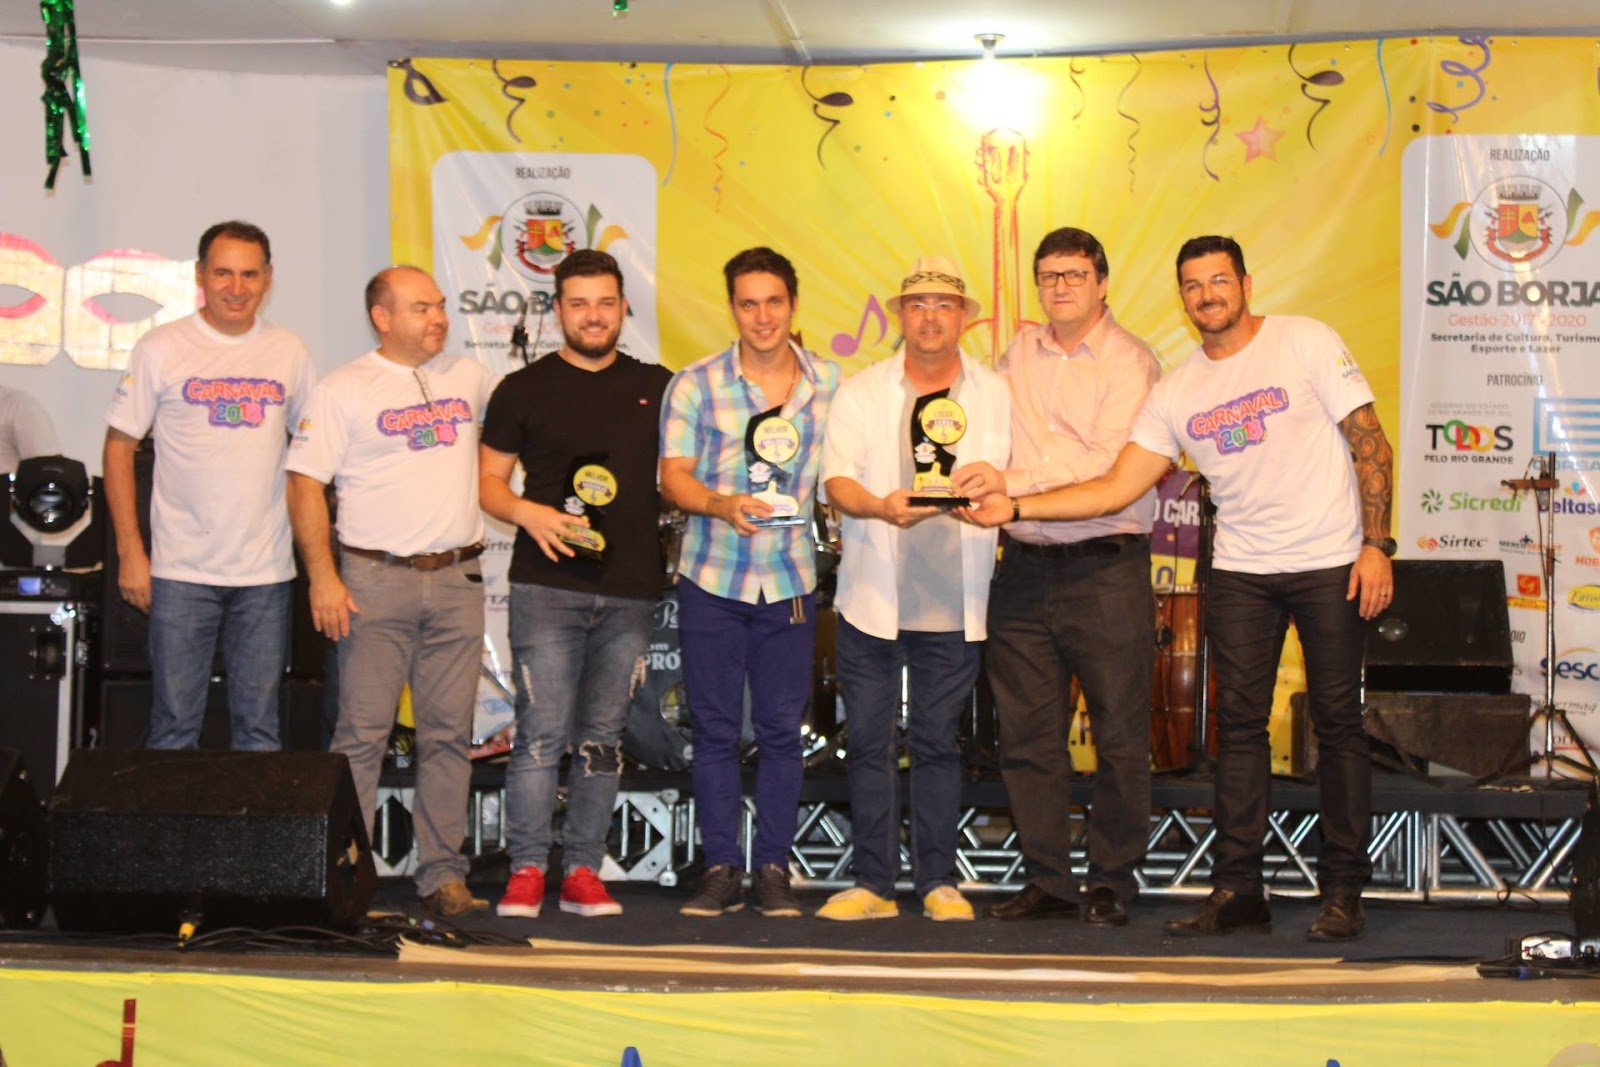 Vencedores do 51º Concurso de Músicas para o Carnaval Apparício Silva Rillo